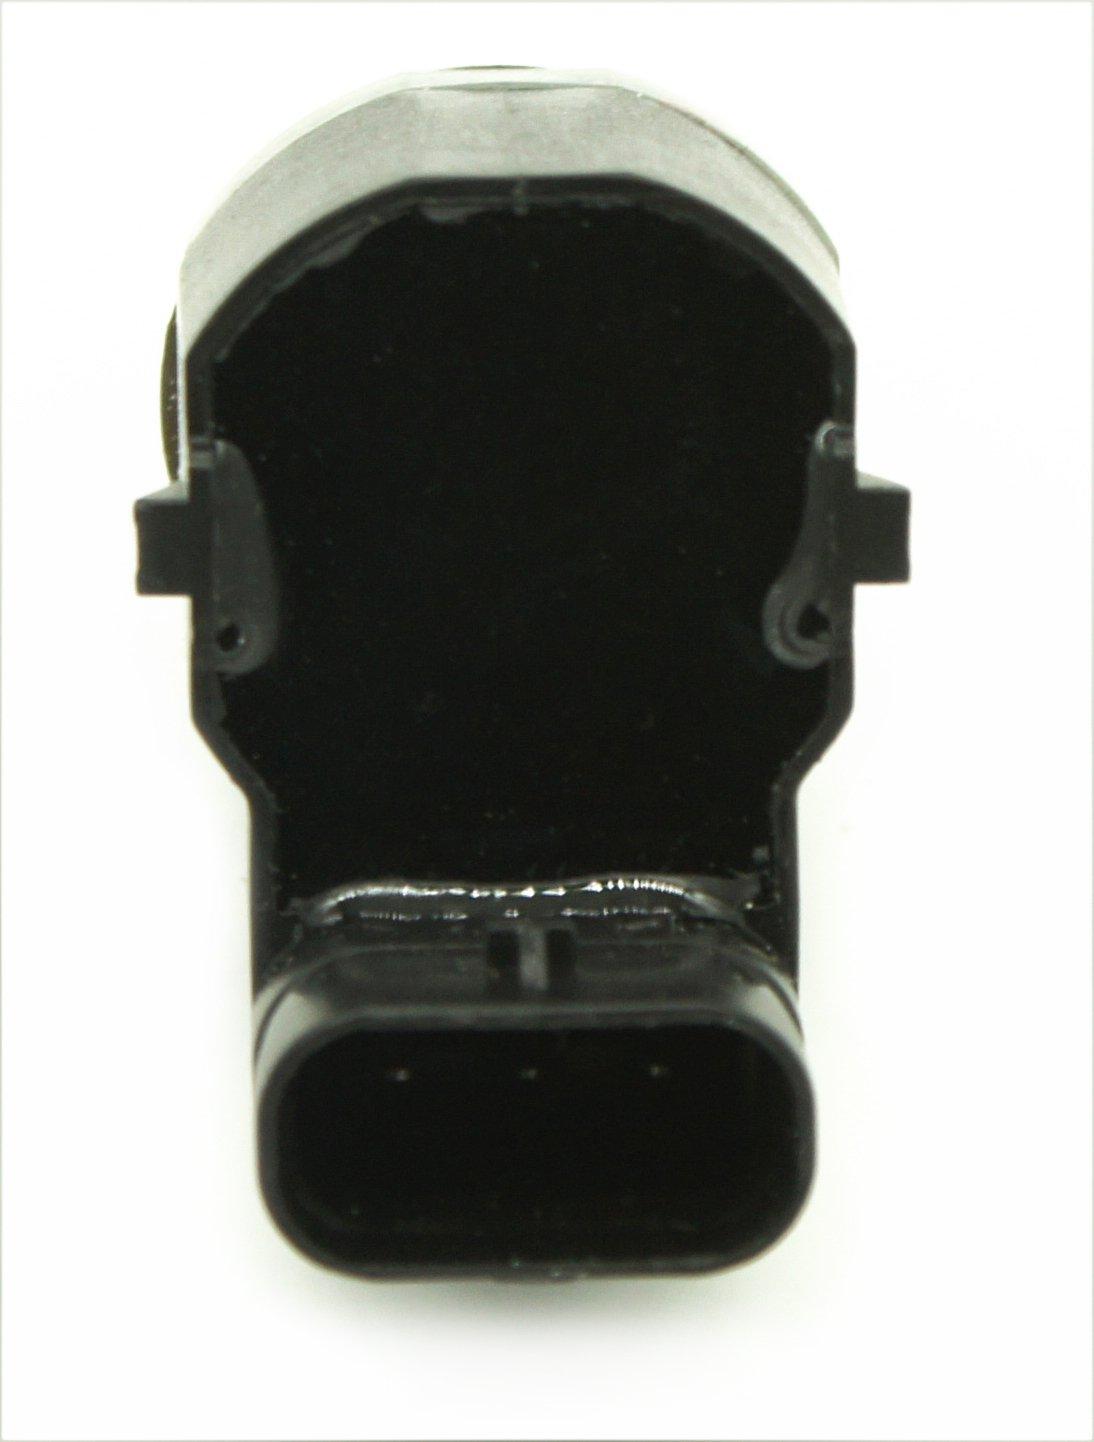 Electronicx Auto PDC Parksensor Ultraschall Sensor Parktronic Parksensoren Parkhilfe Parkassistent 66202180495